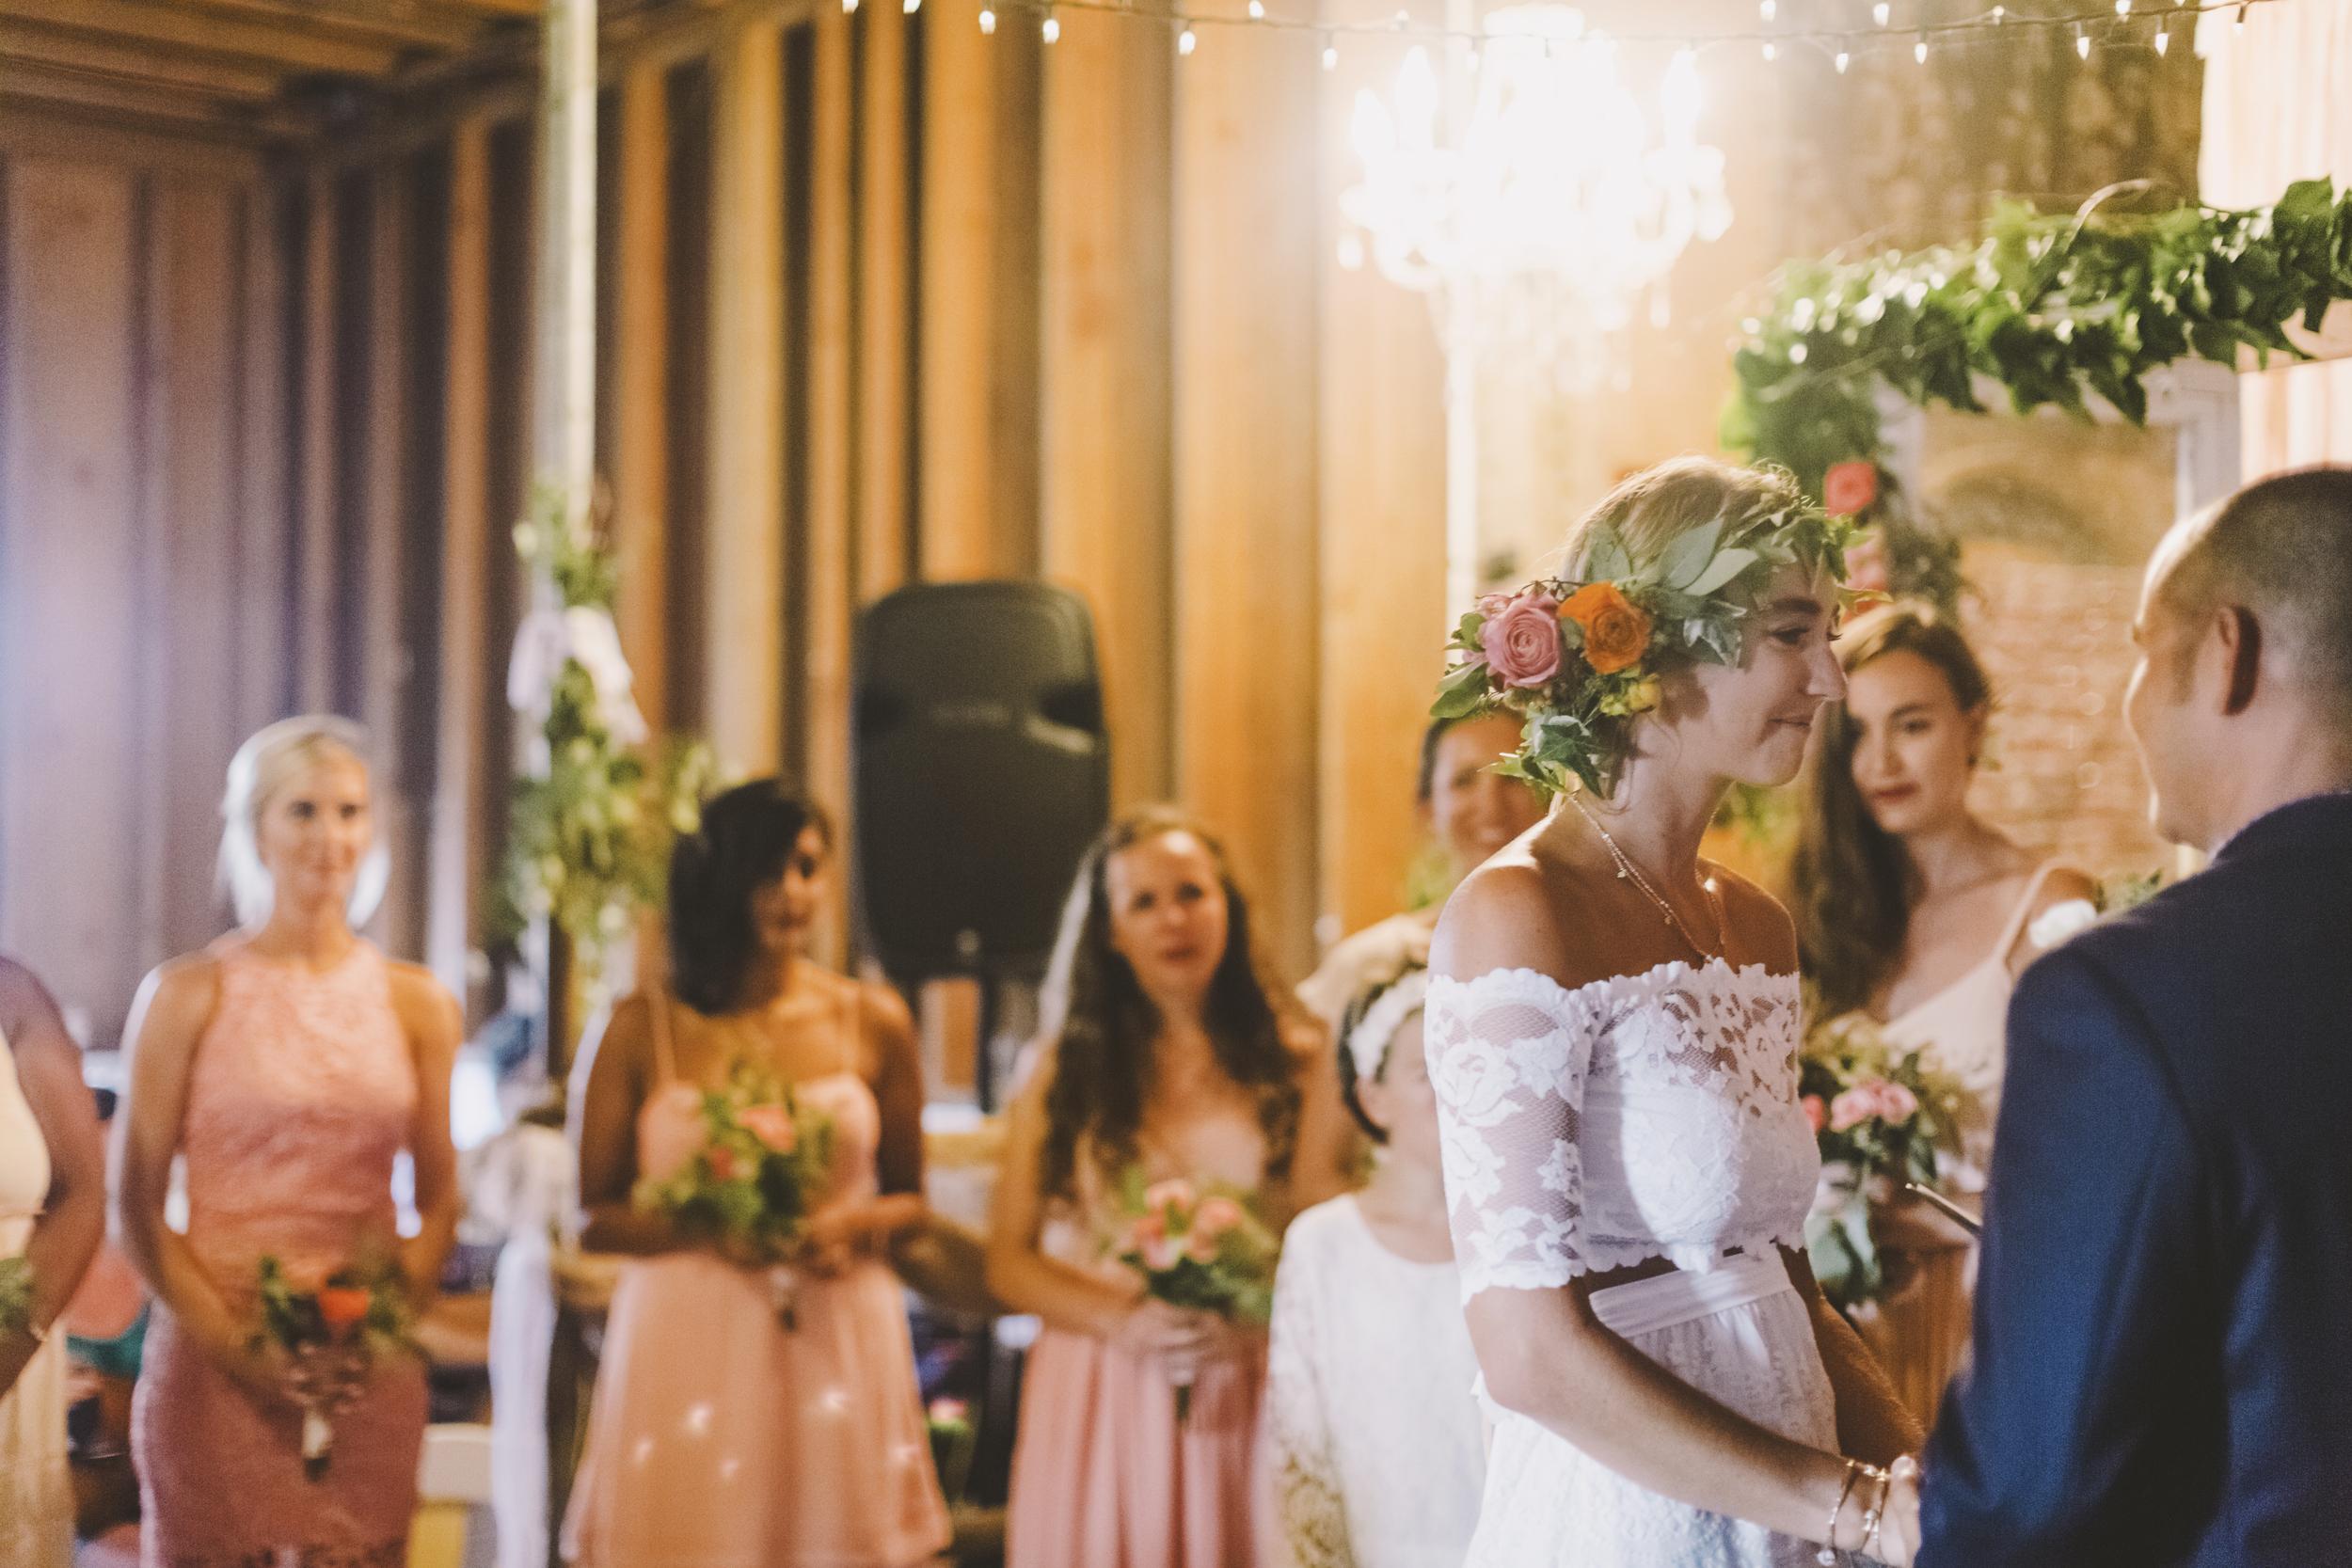 angie-diaz-photography-oahu-hawaii-wedding-tradewinds-ranch-58.jpg